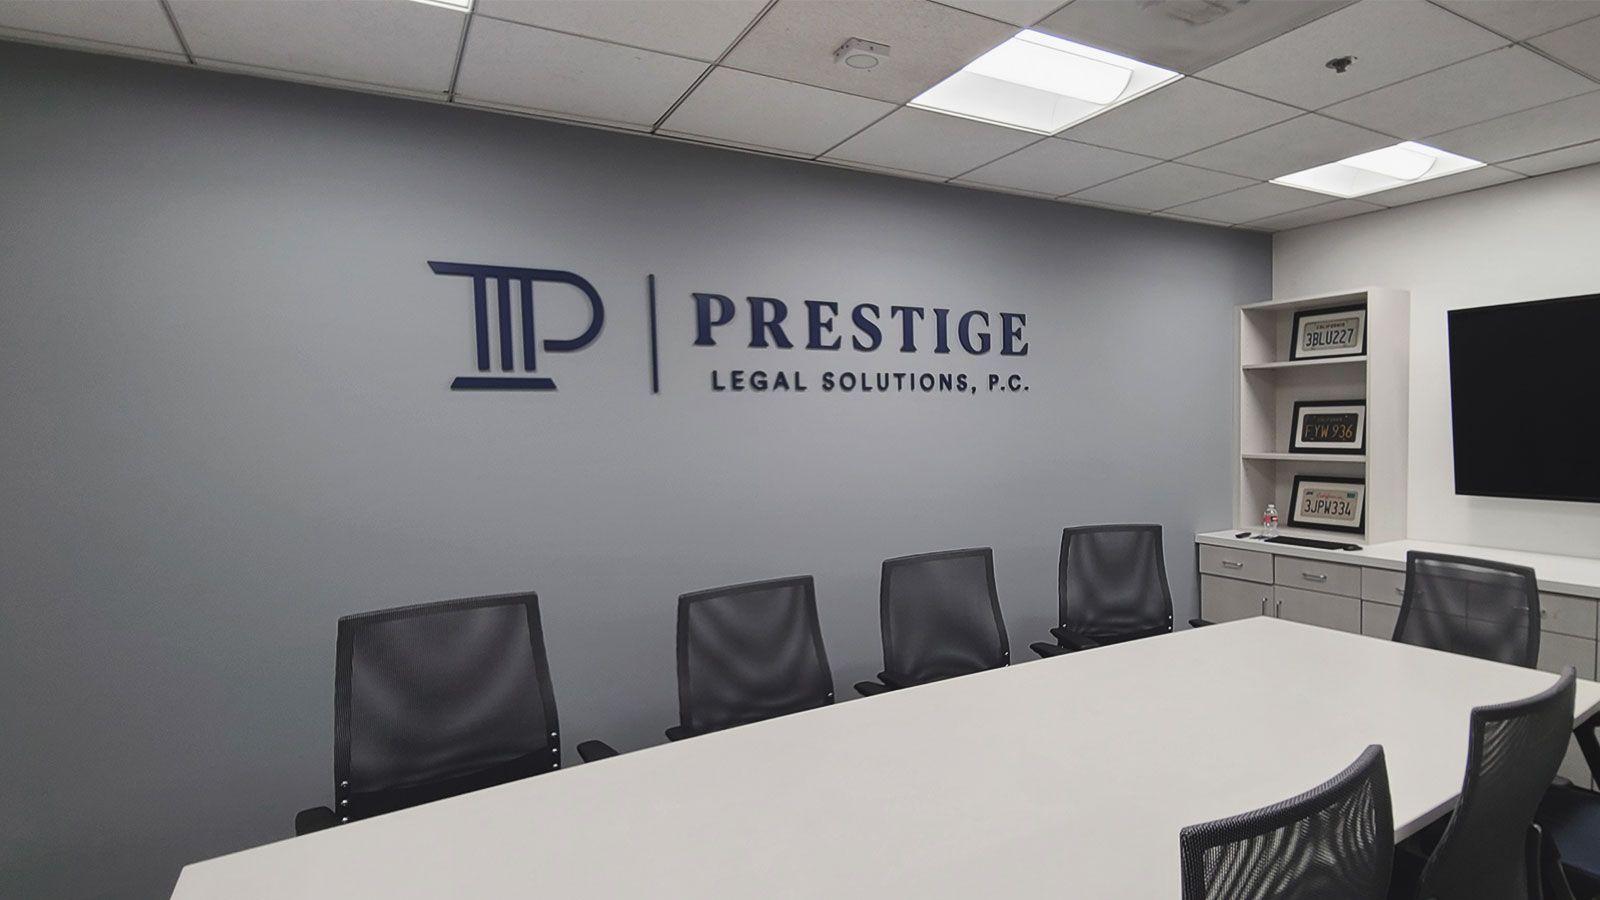 Prestige Legal Solutions 3D Letters